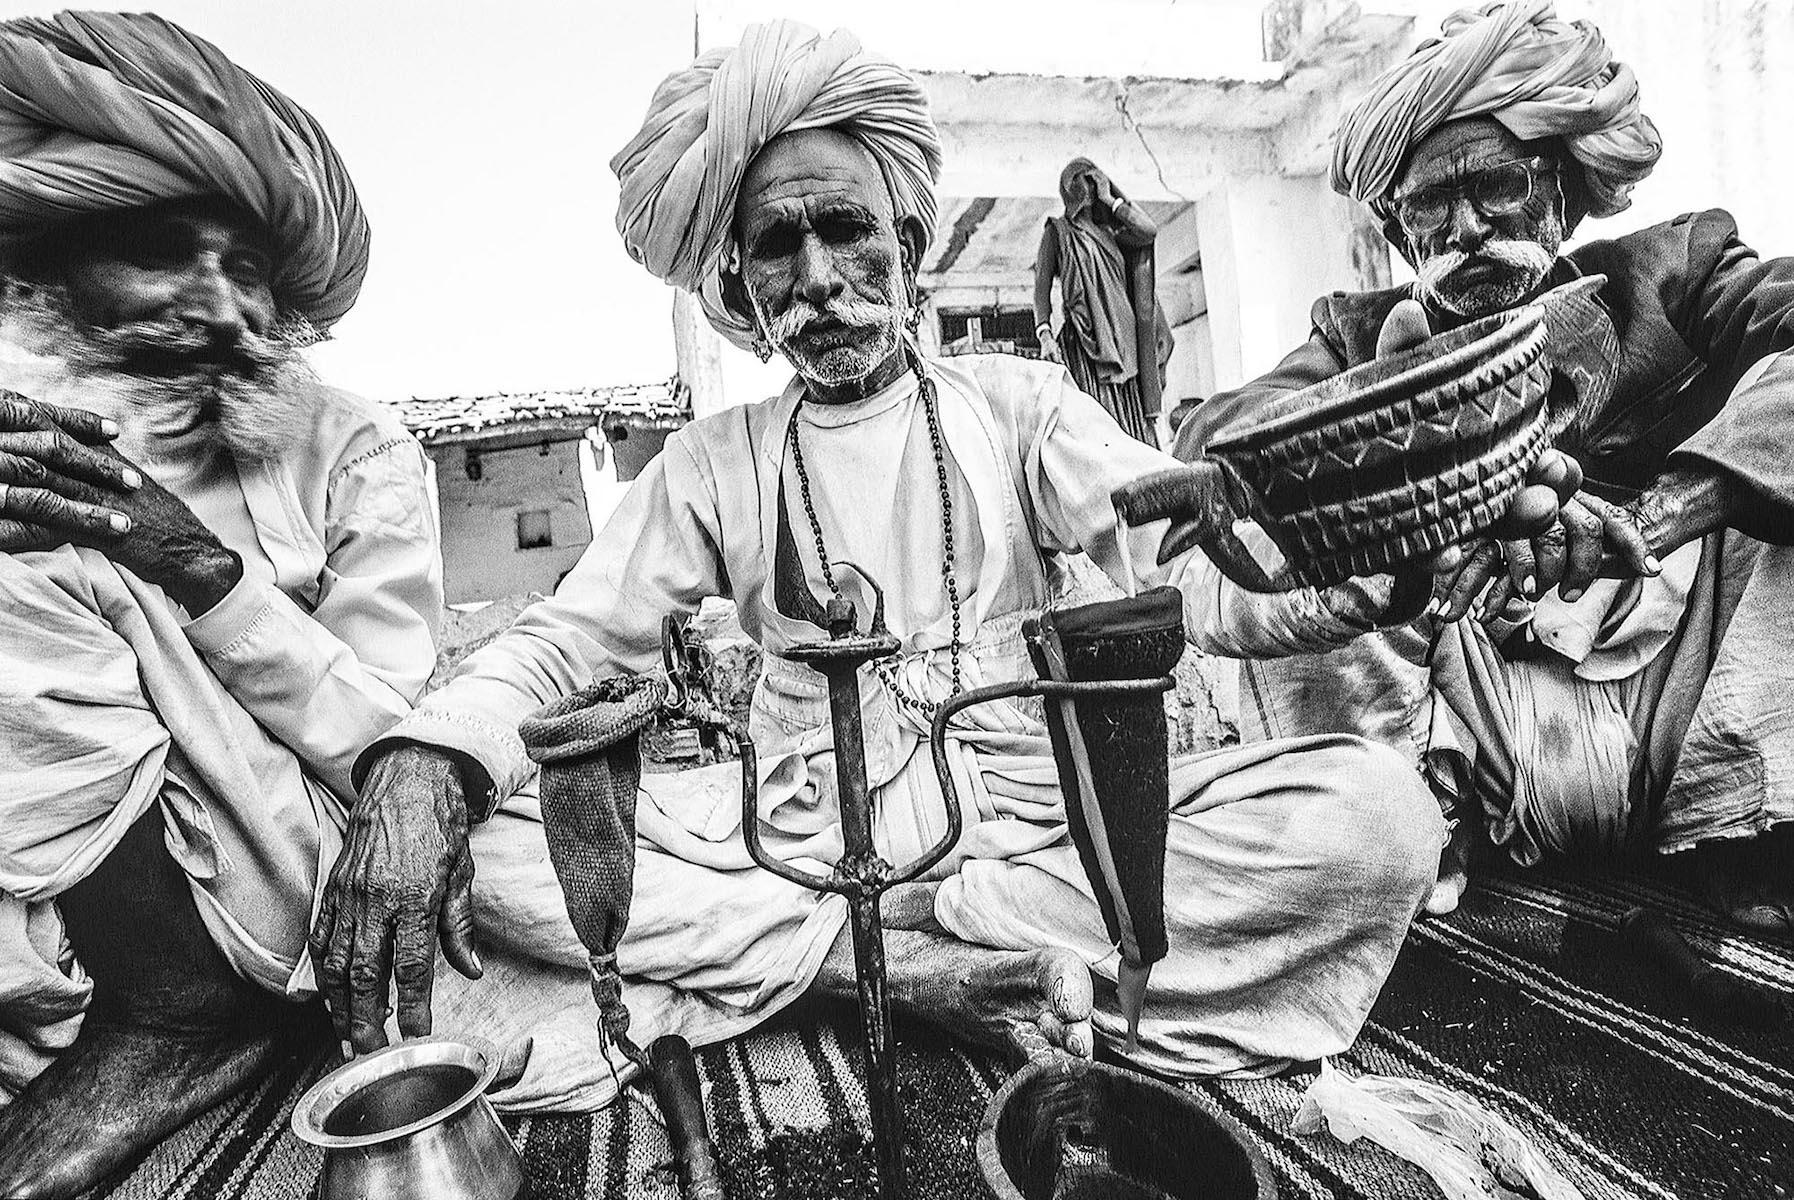 Opium ritual; India 2002